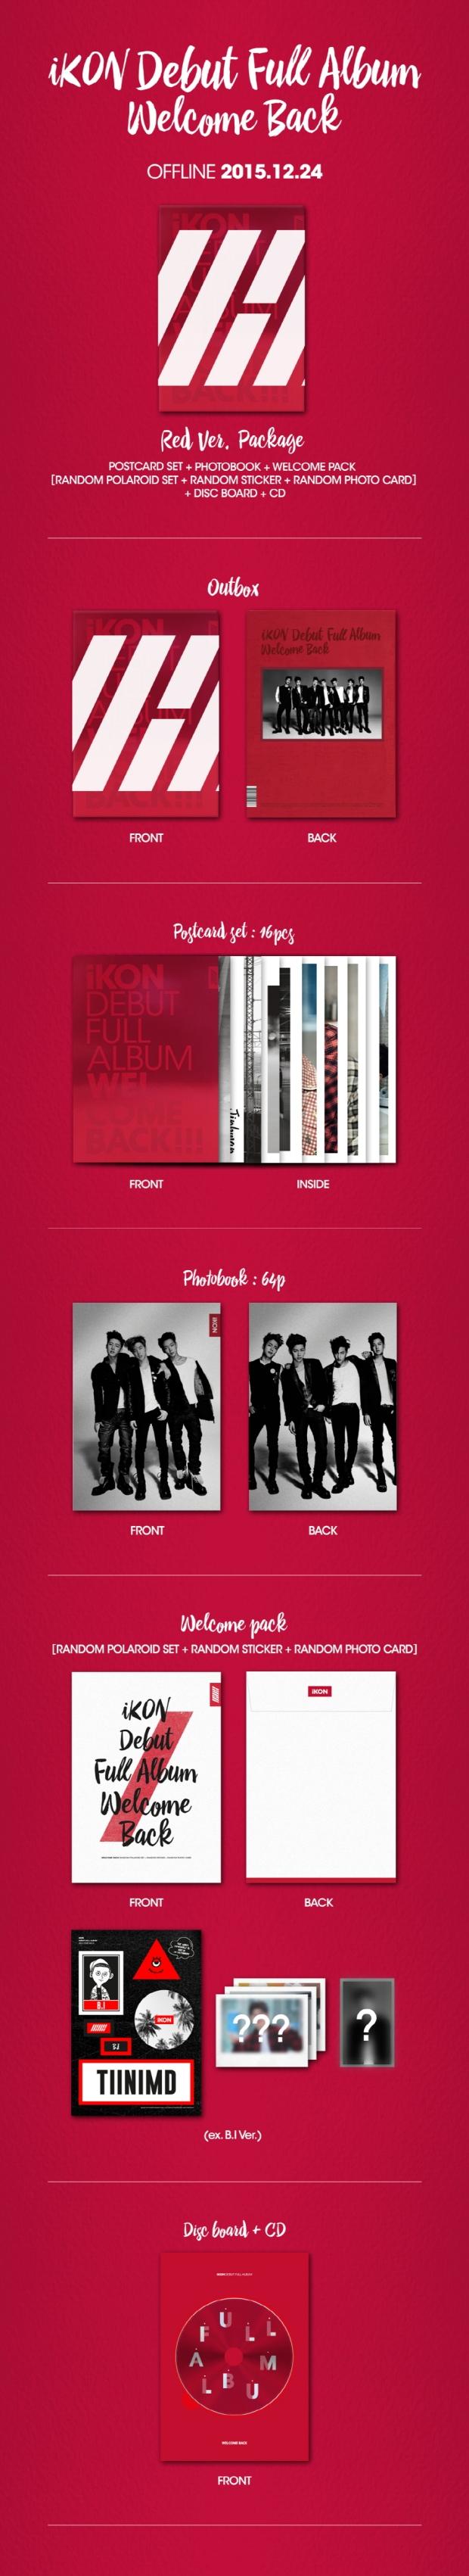 ikon_full_album_red_02